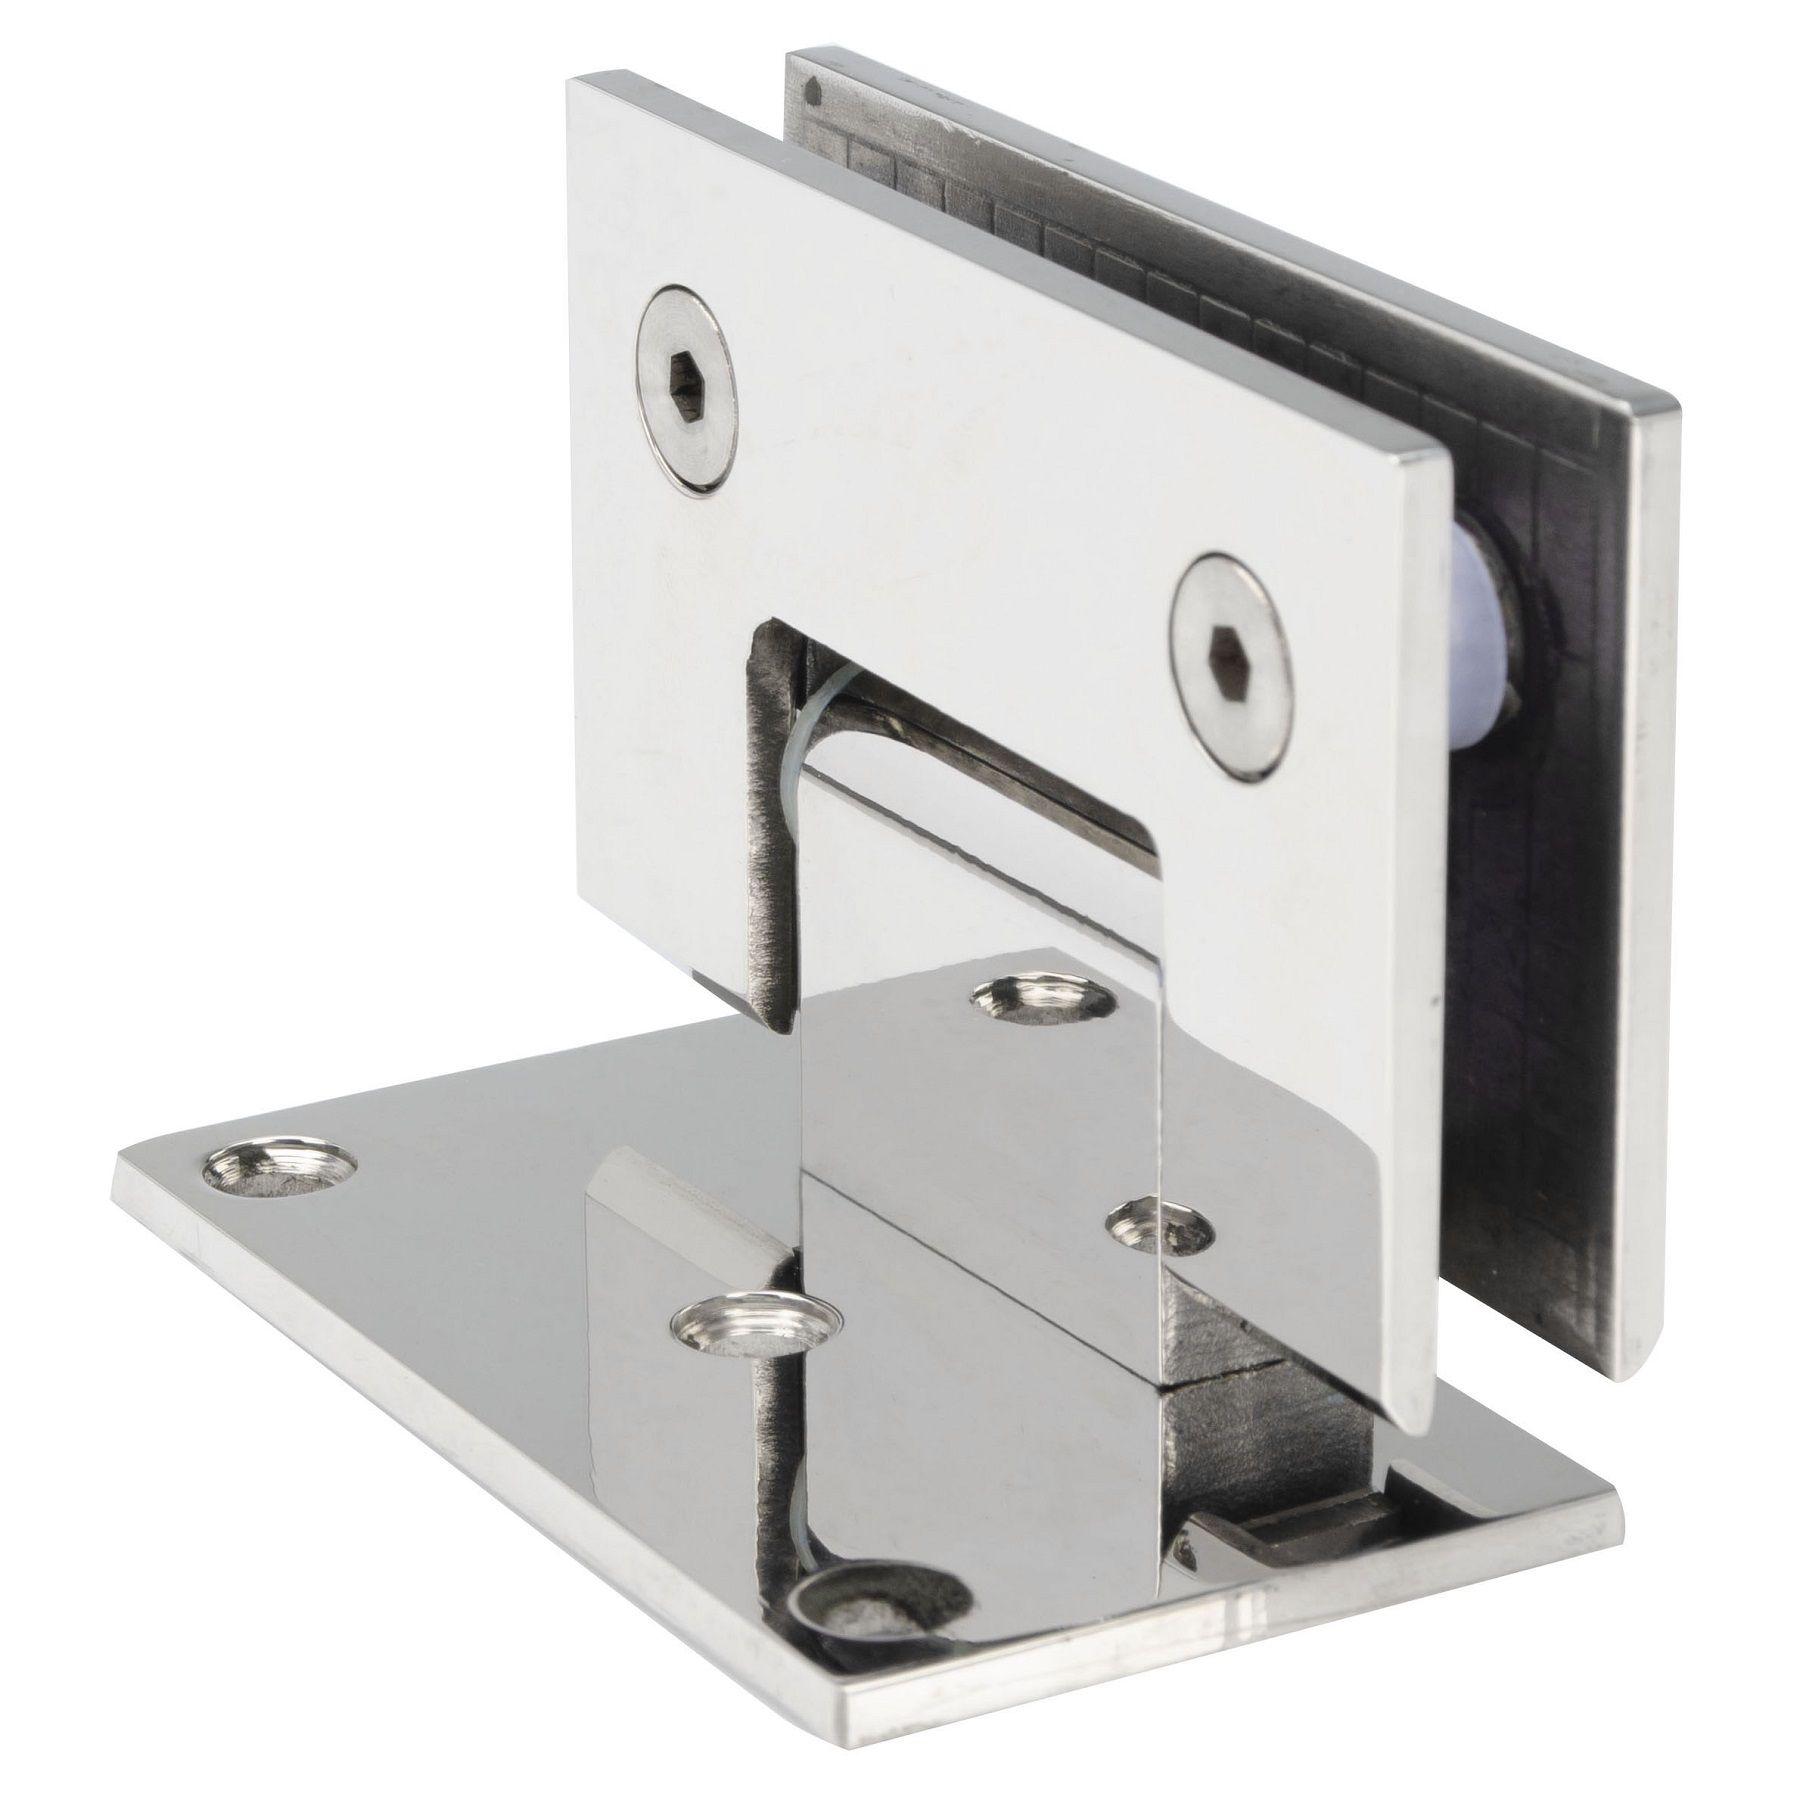 Dobradiça inox GV48 90º 1011 para porta de vidro e box - alvenaria/vidro